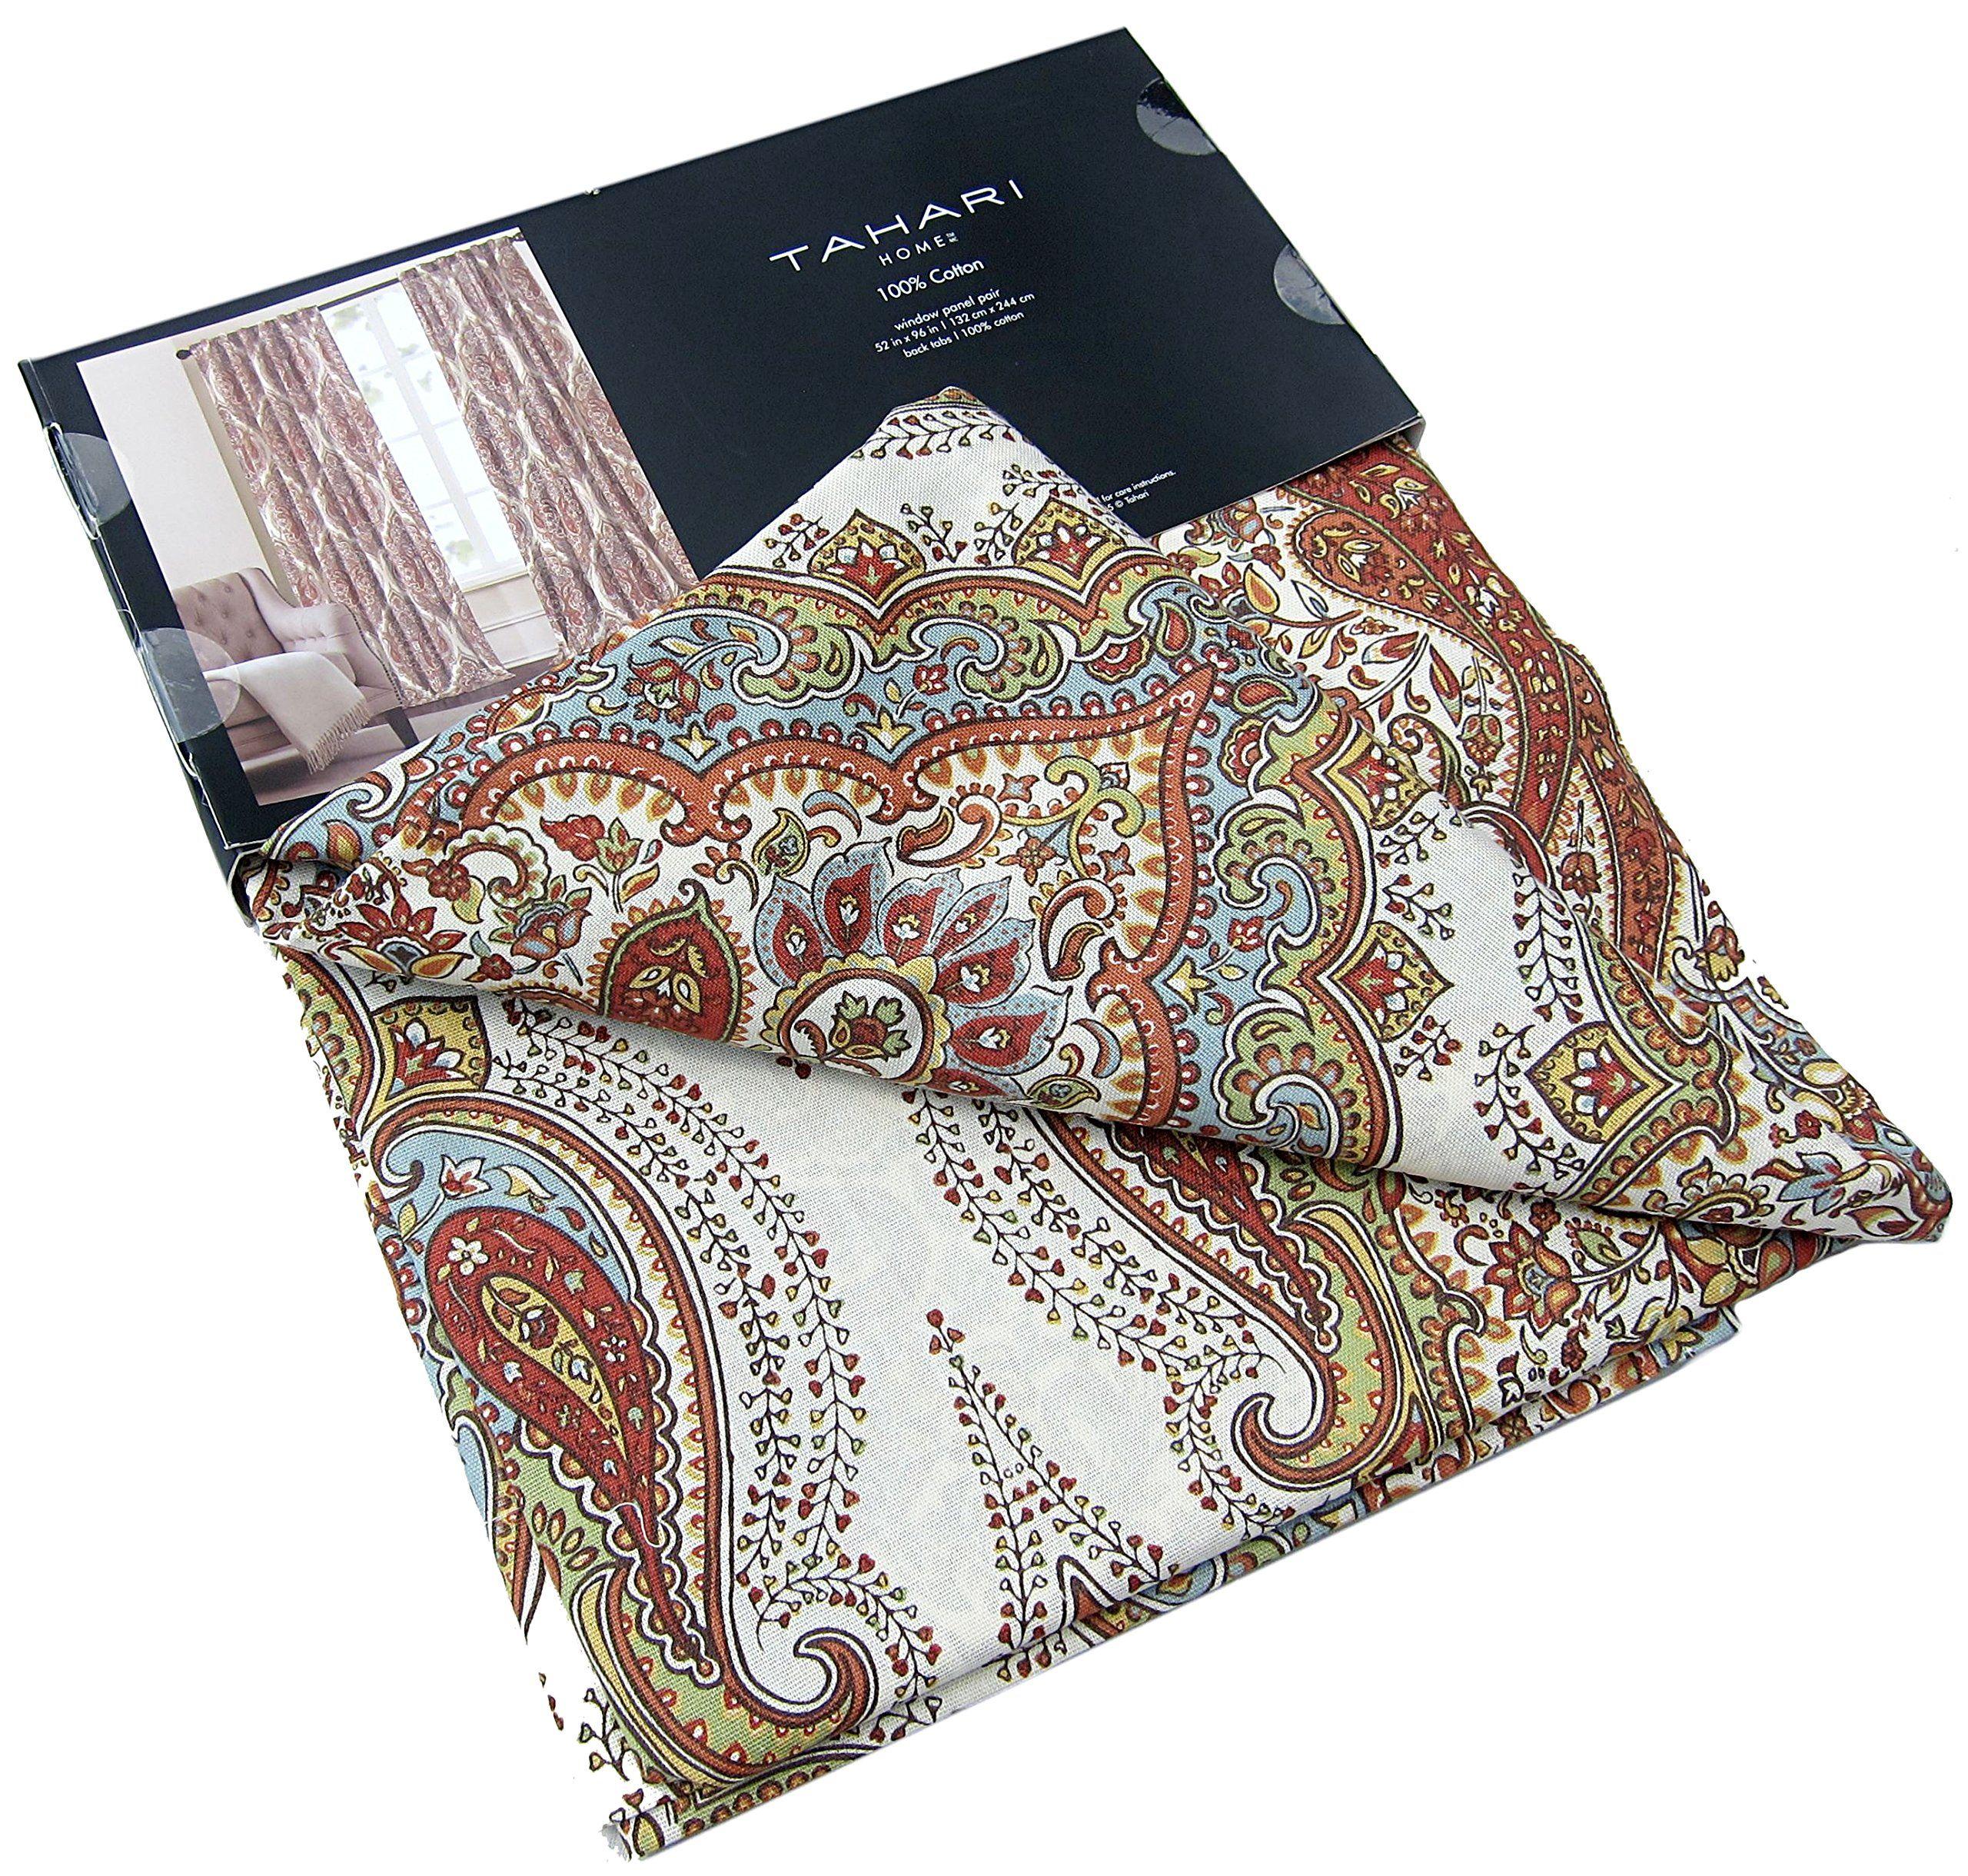 Tahari Home Paisley Scrolls Window Panels 52 By 96 Inch Set Of 2